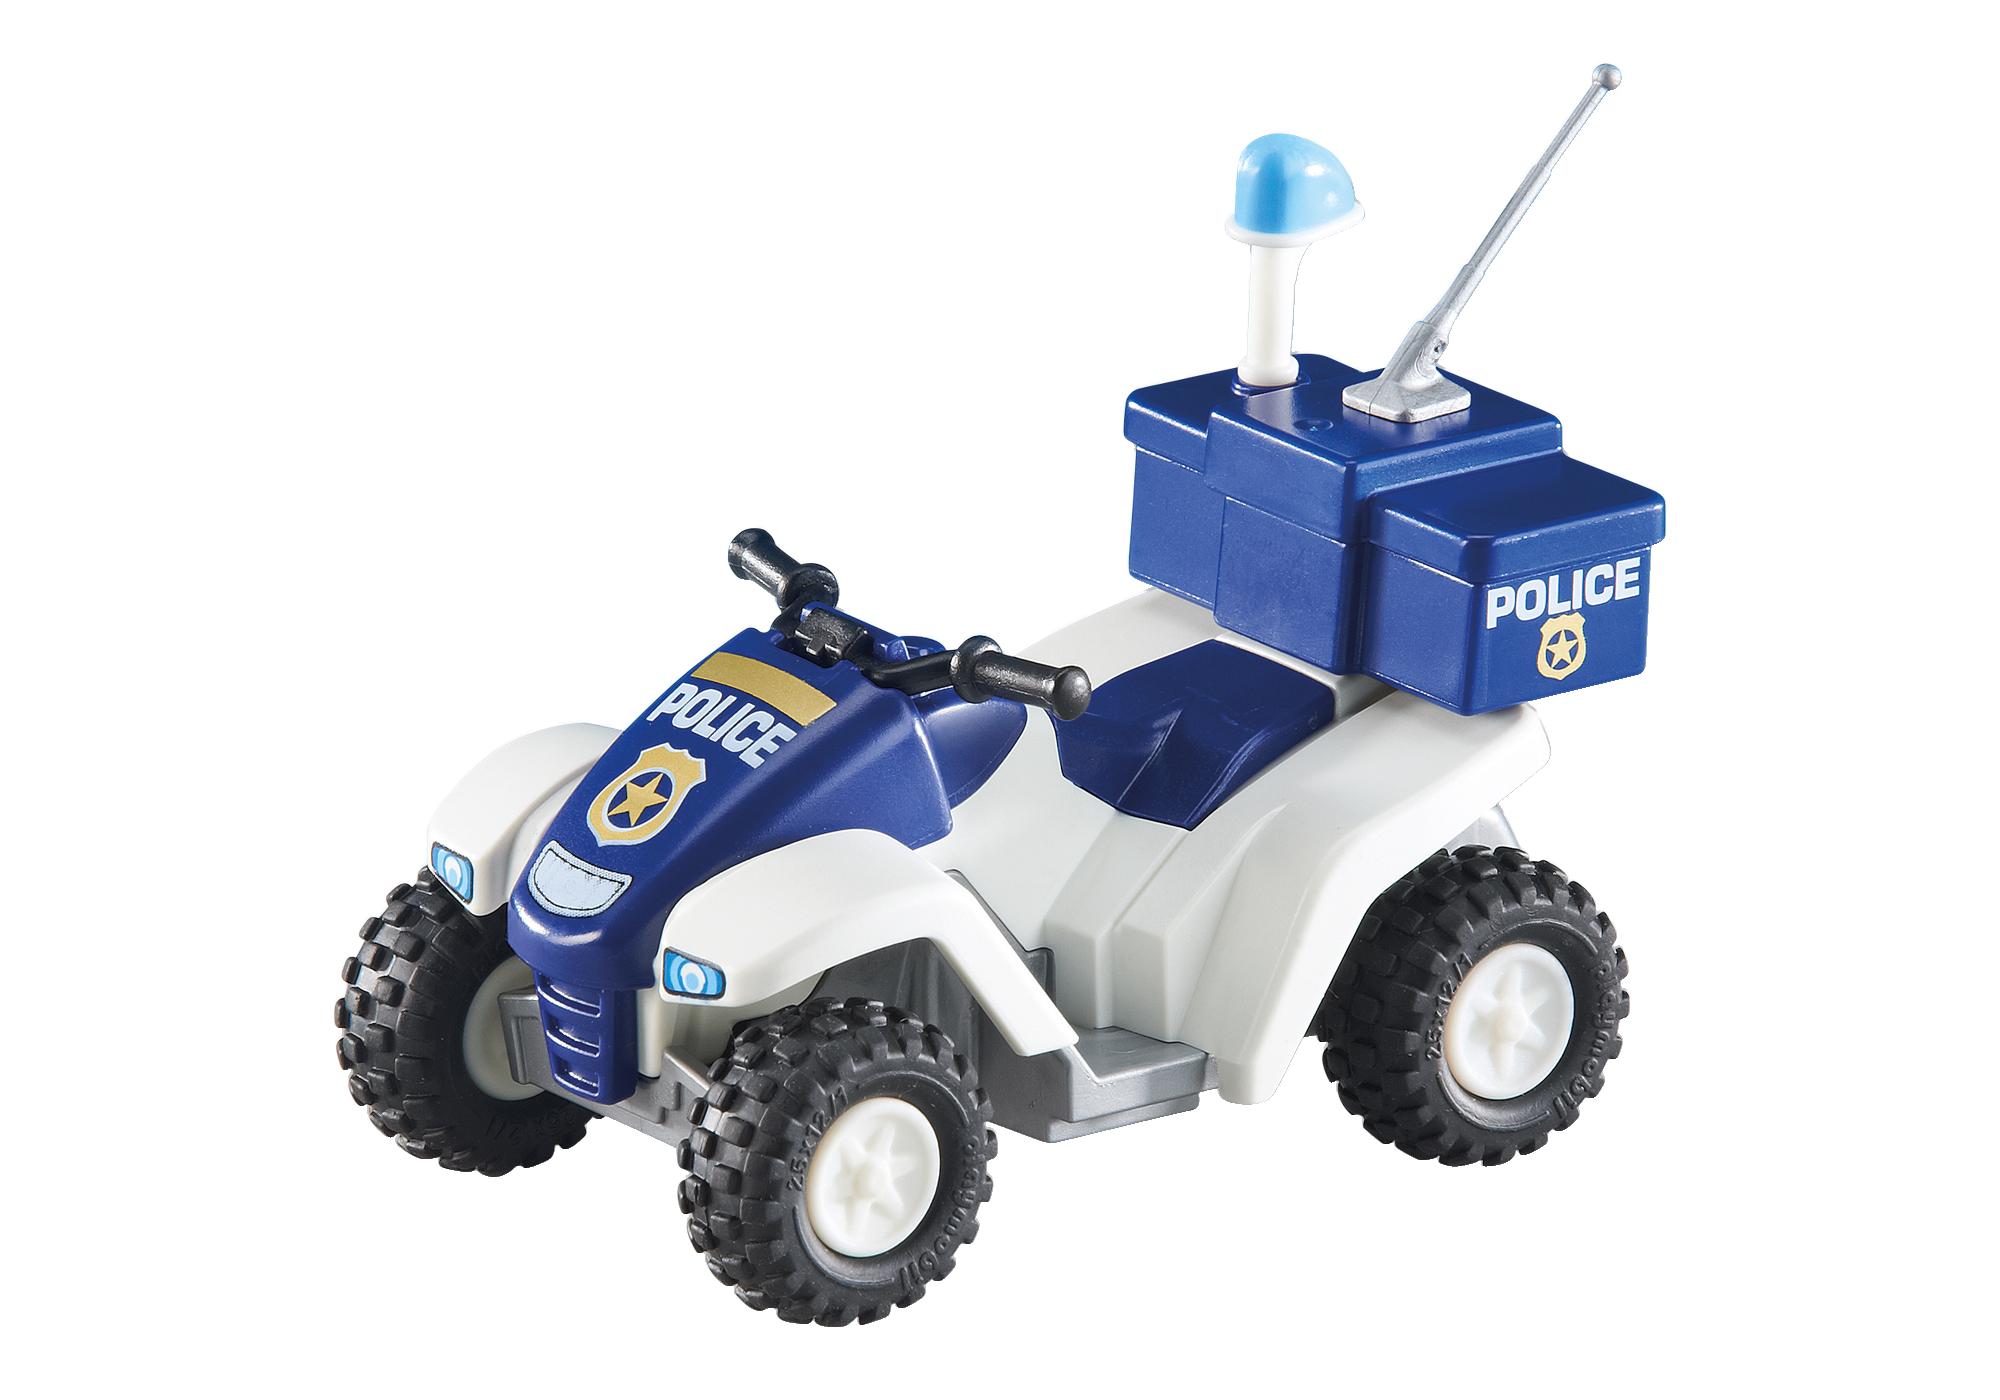 http://media.playmobil.com/i/playmobil/6504_product_detail/Police Quad Bike